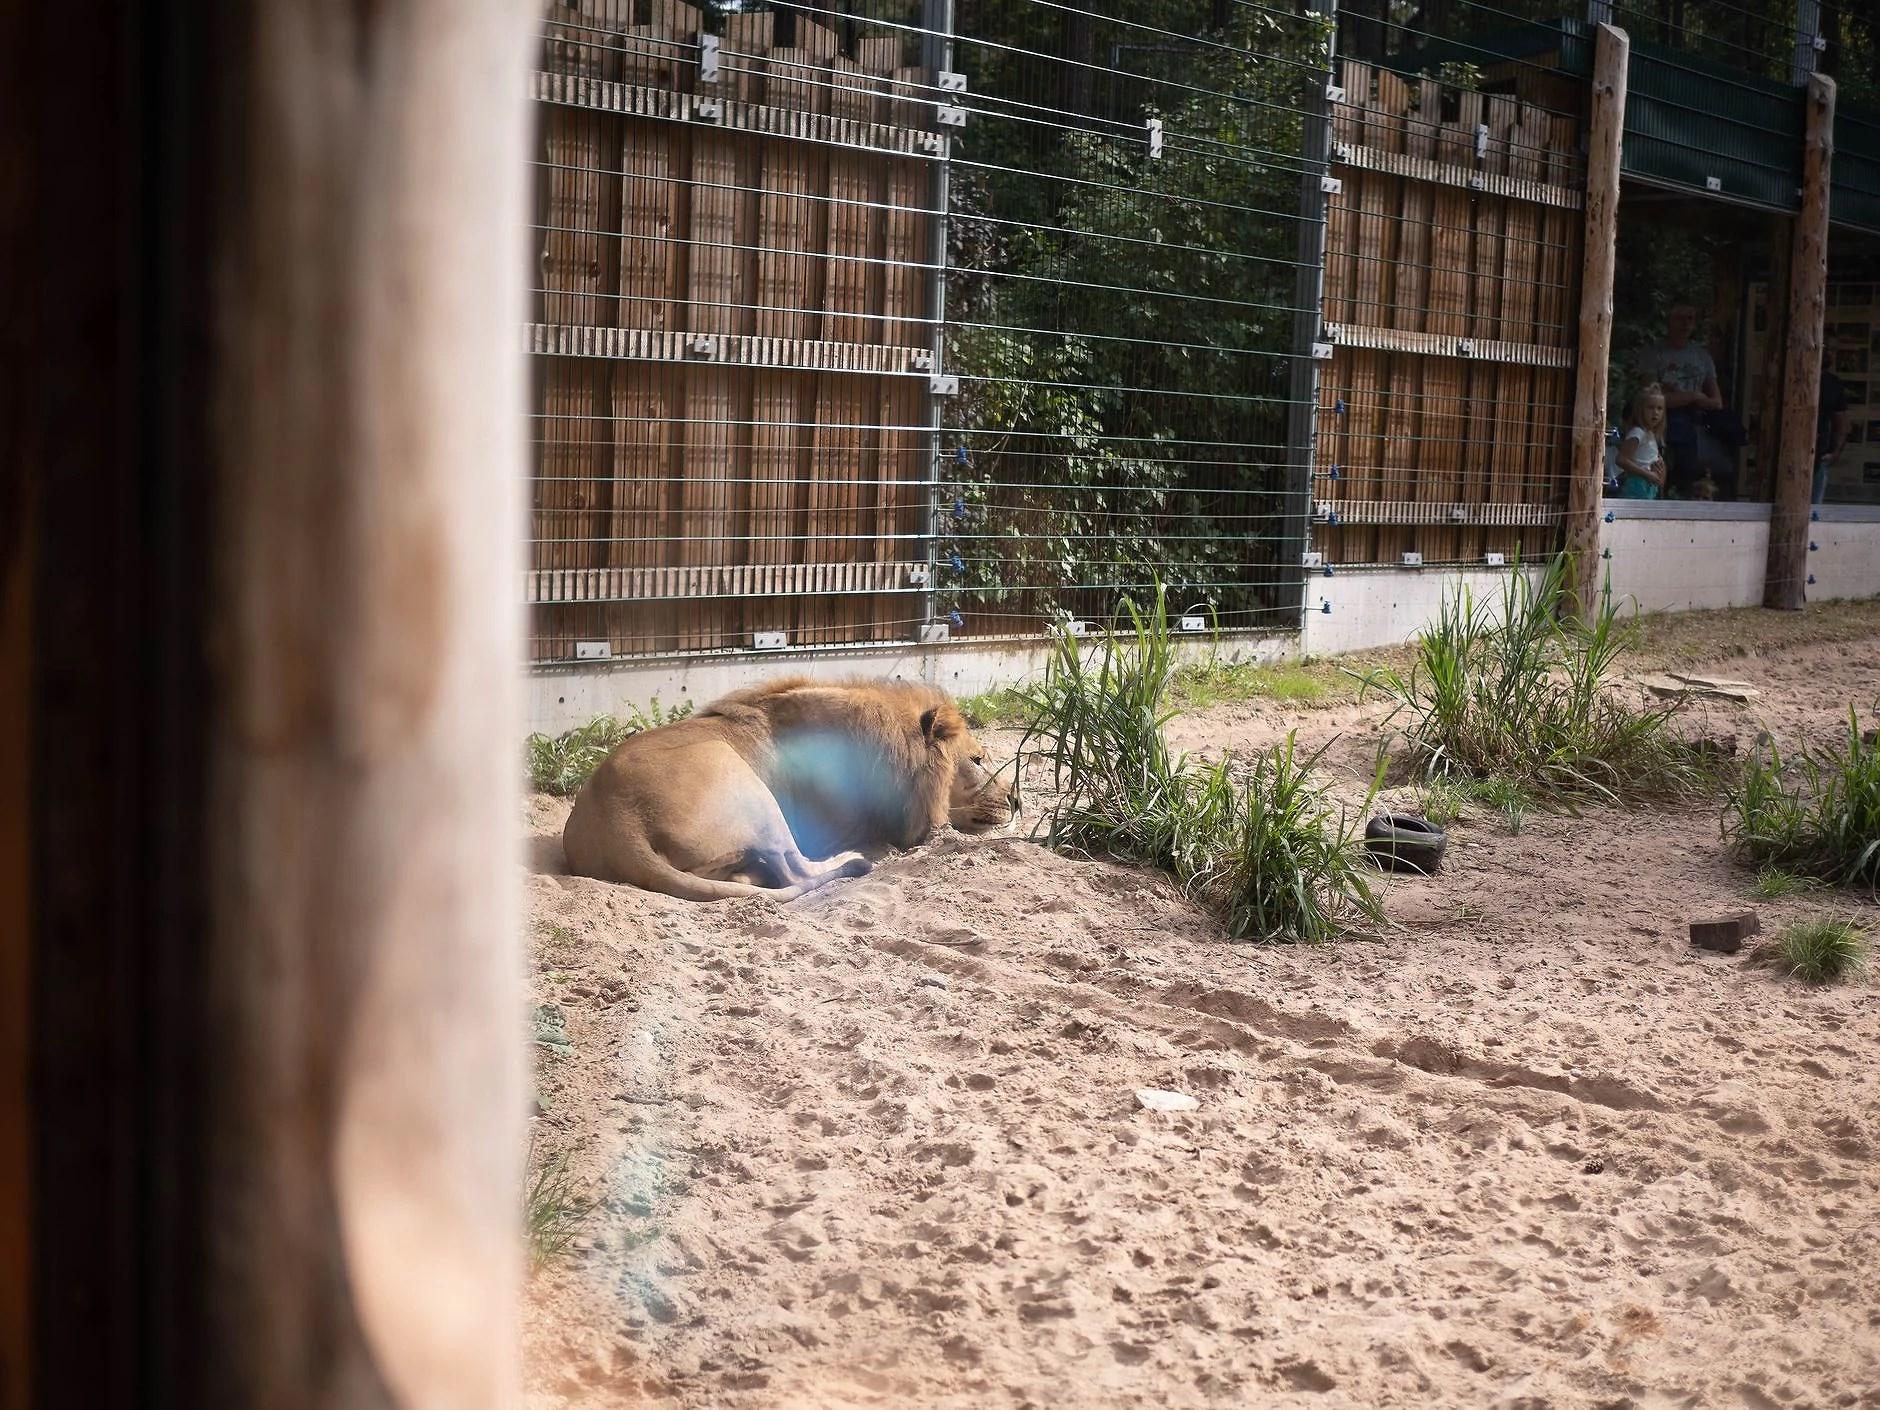 Riga Zoo bildedryss